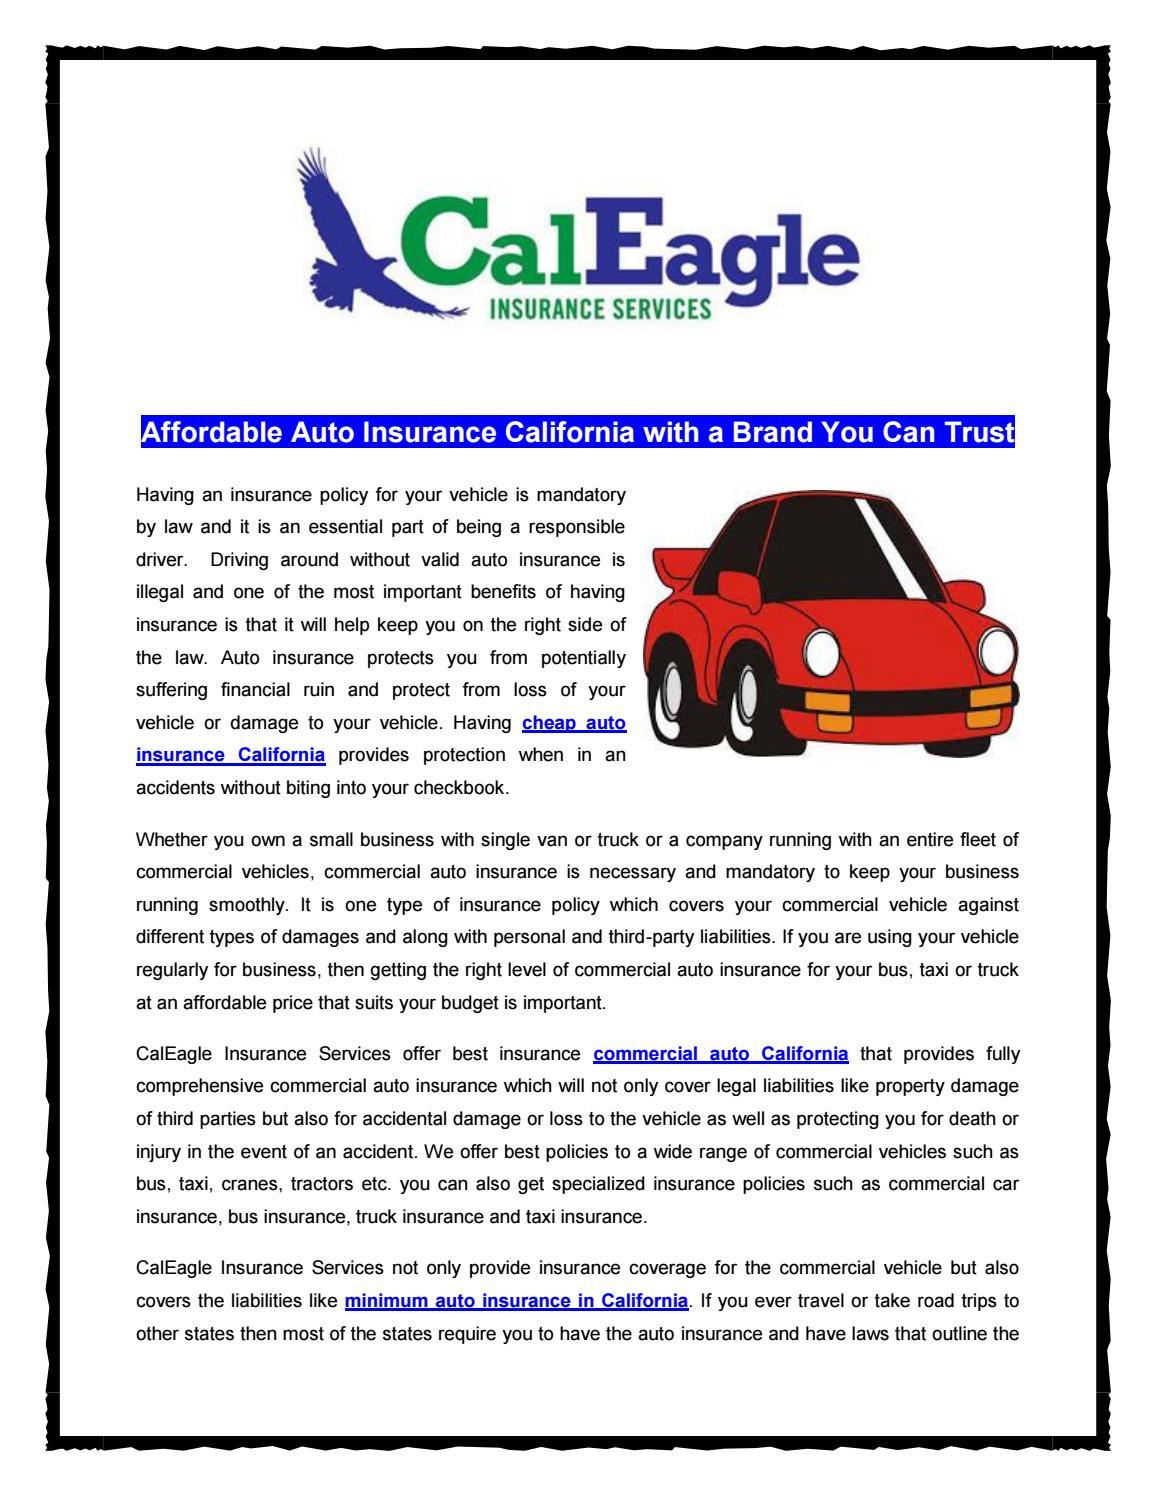 Affordable auto insurance california by CalEagle Insurance